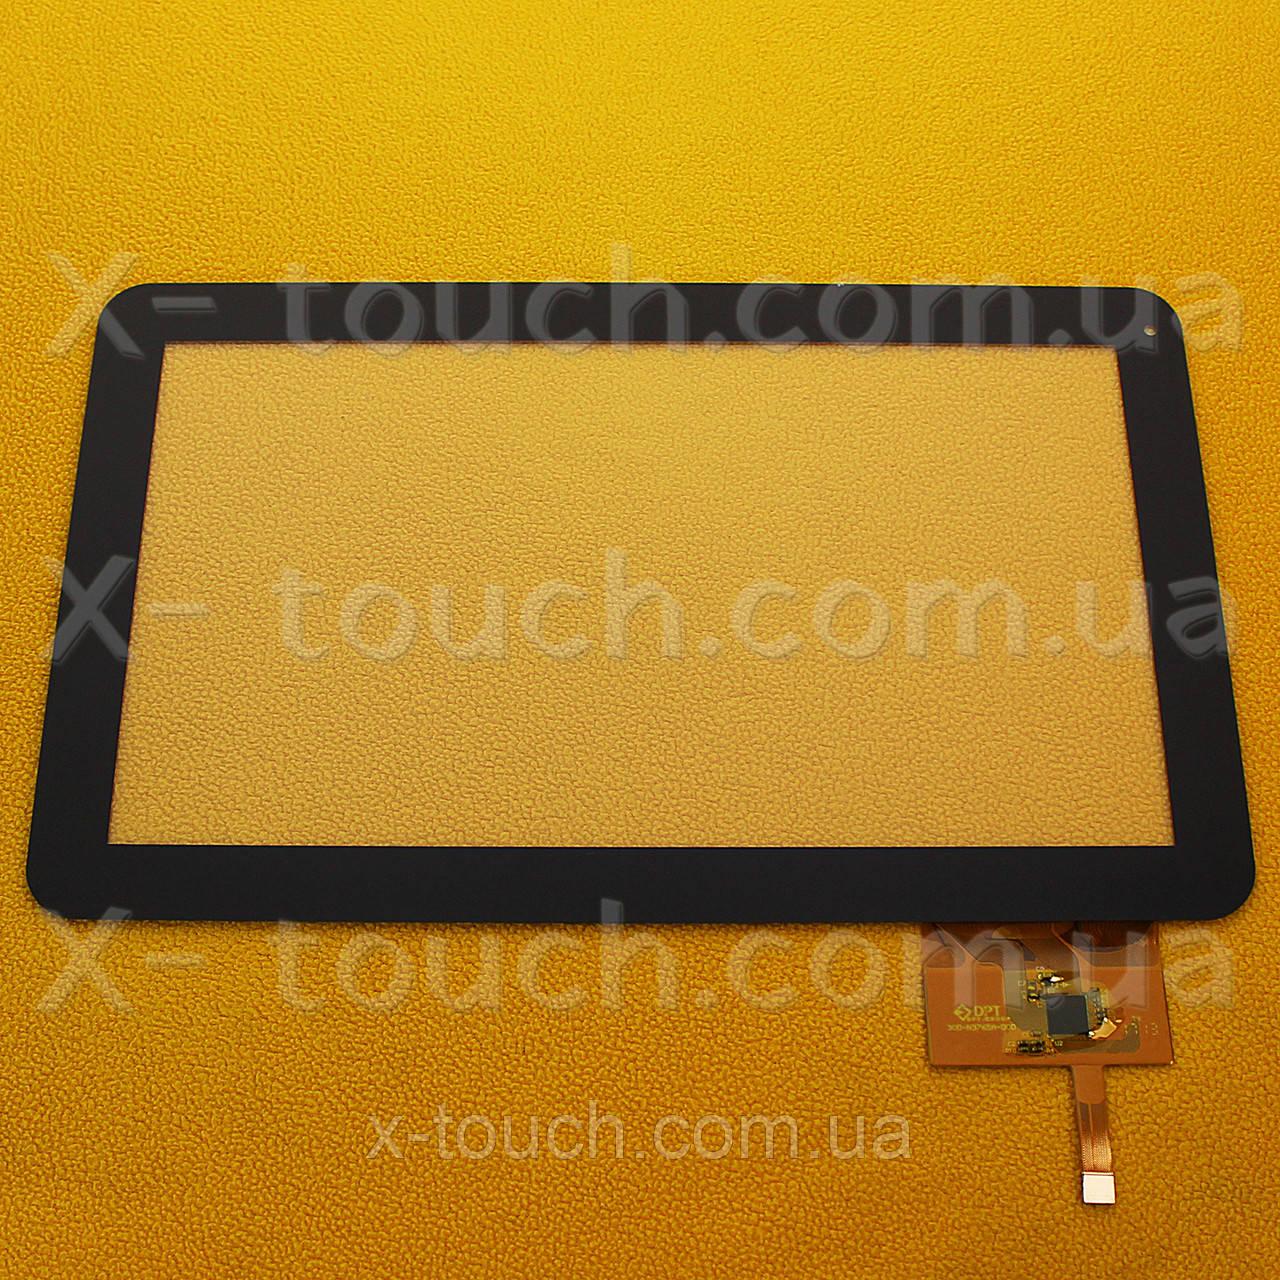 Тачскрин, сенсор  DPT 300-N3765A  для планшета